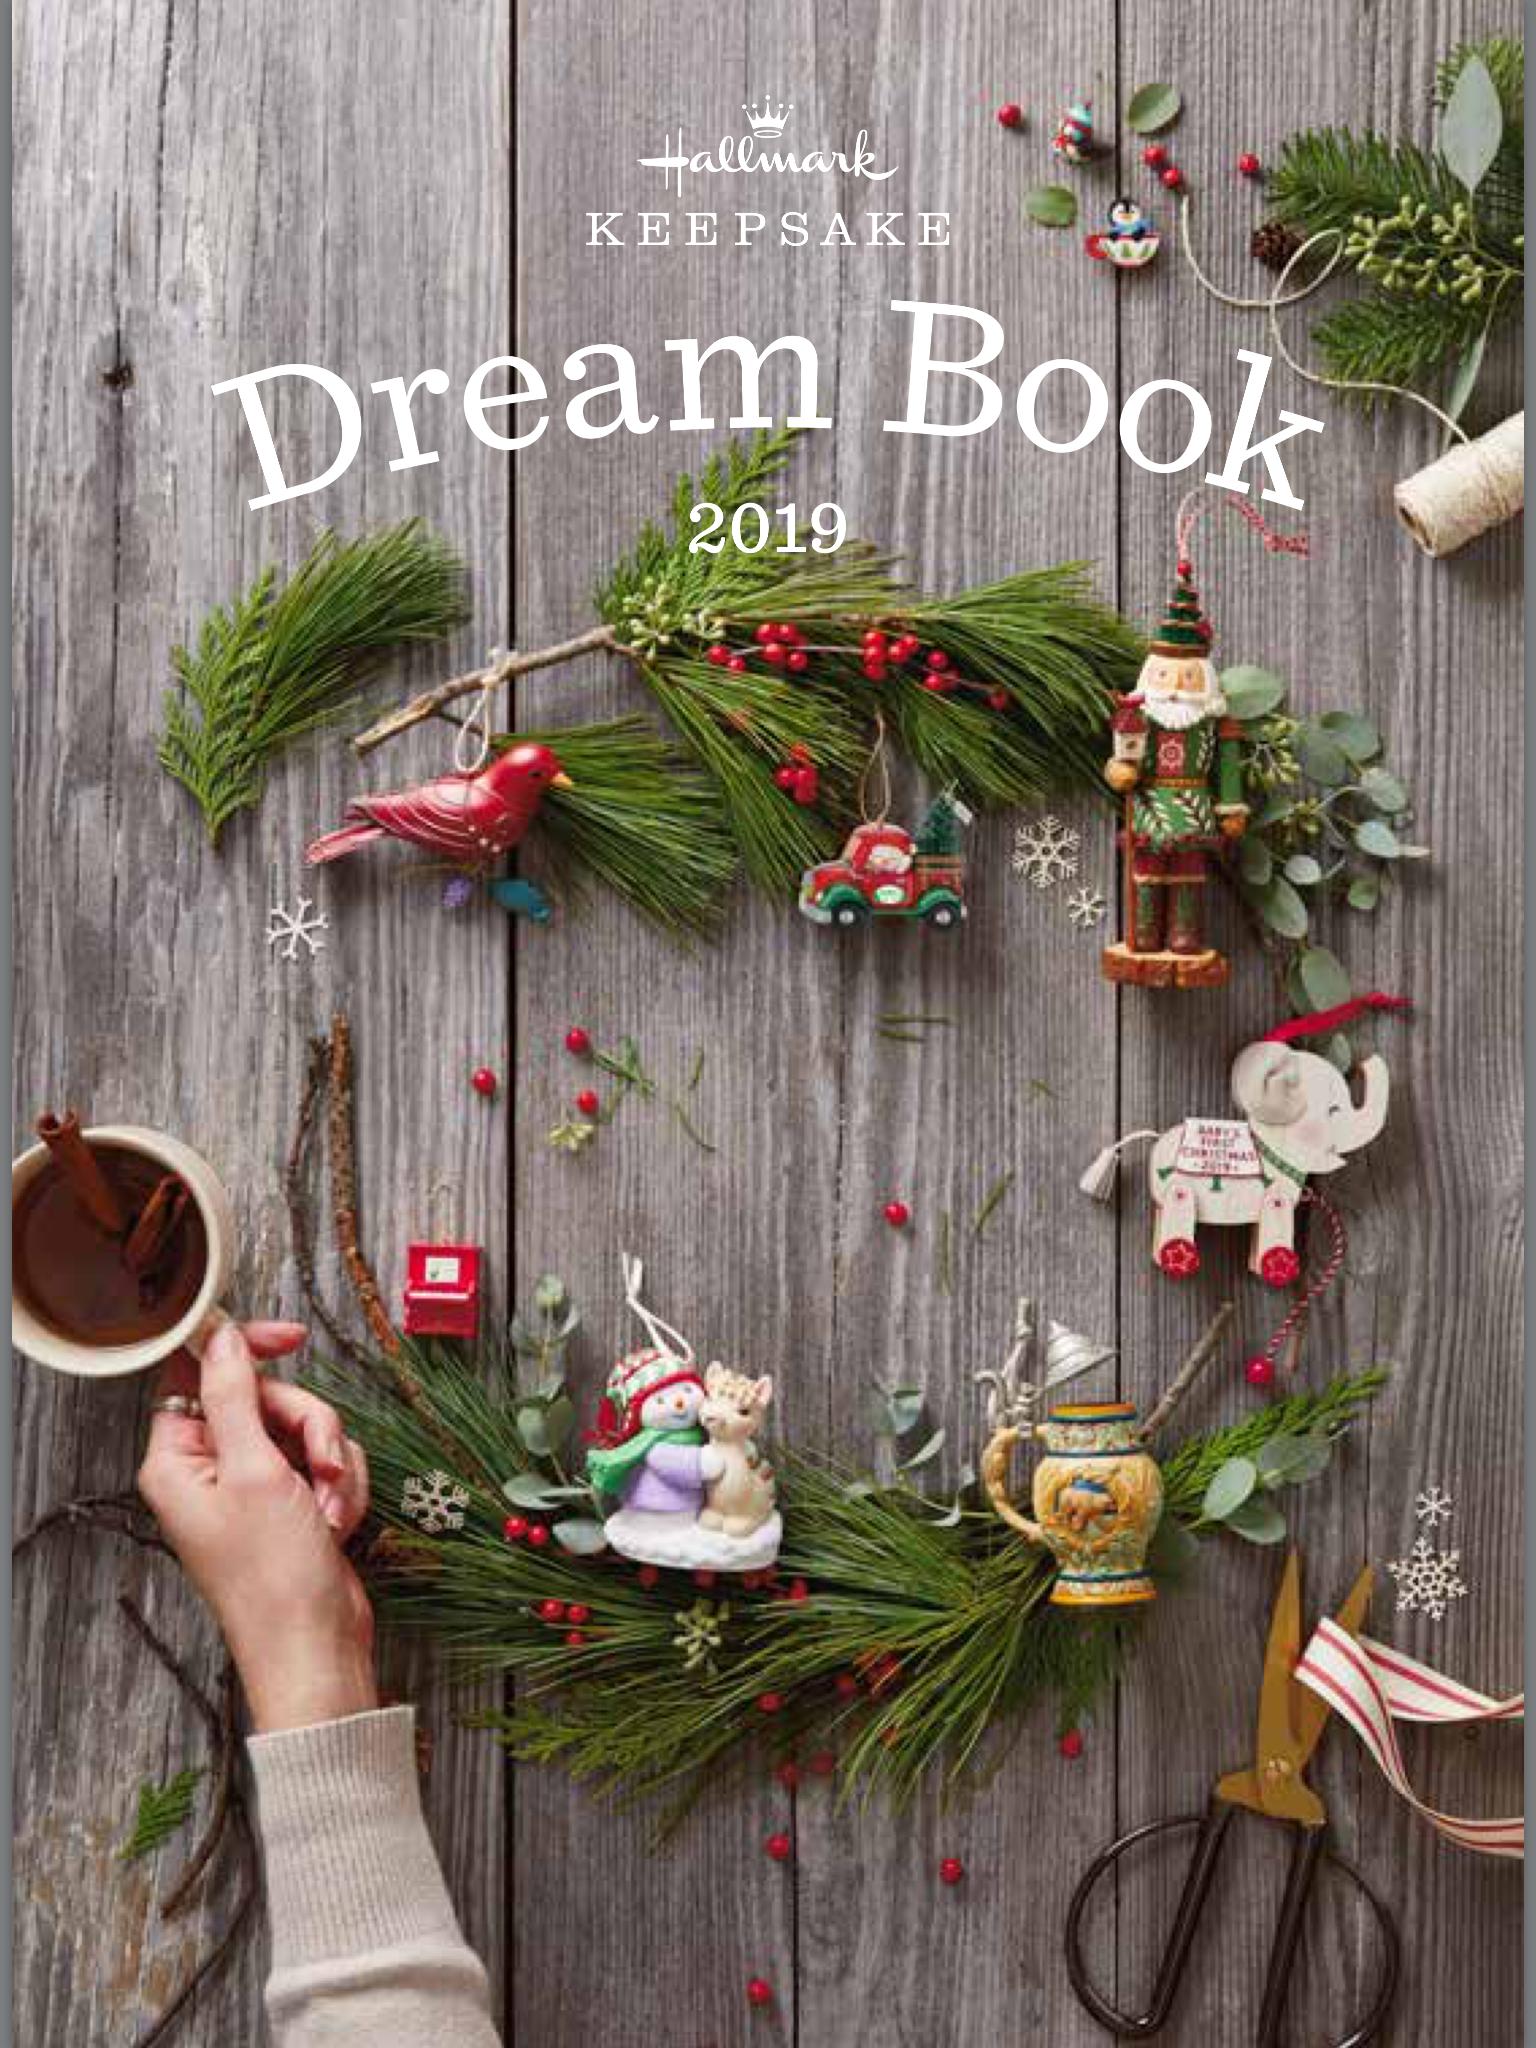 2019 Hallmark Dream Book Hallmark Star Trek Ornaments